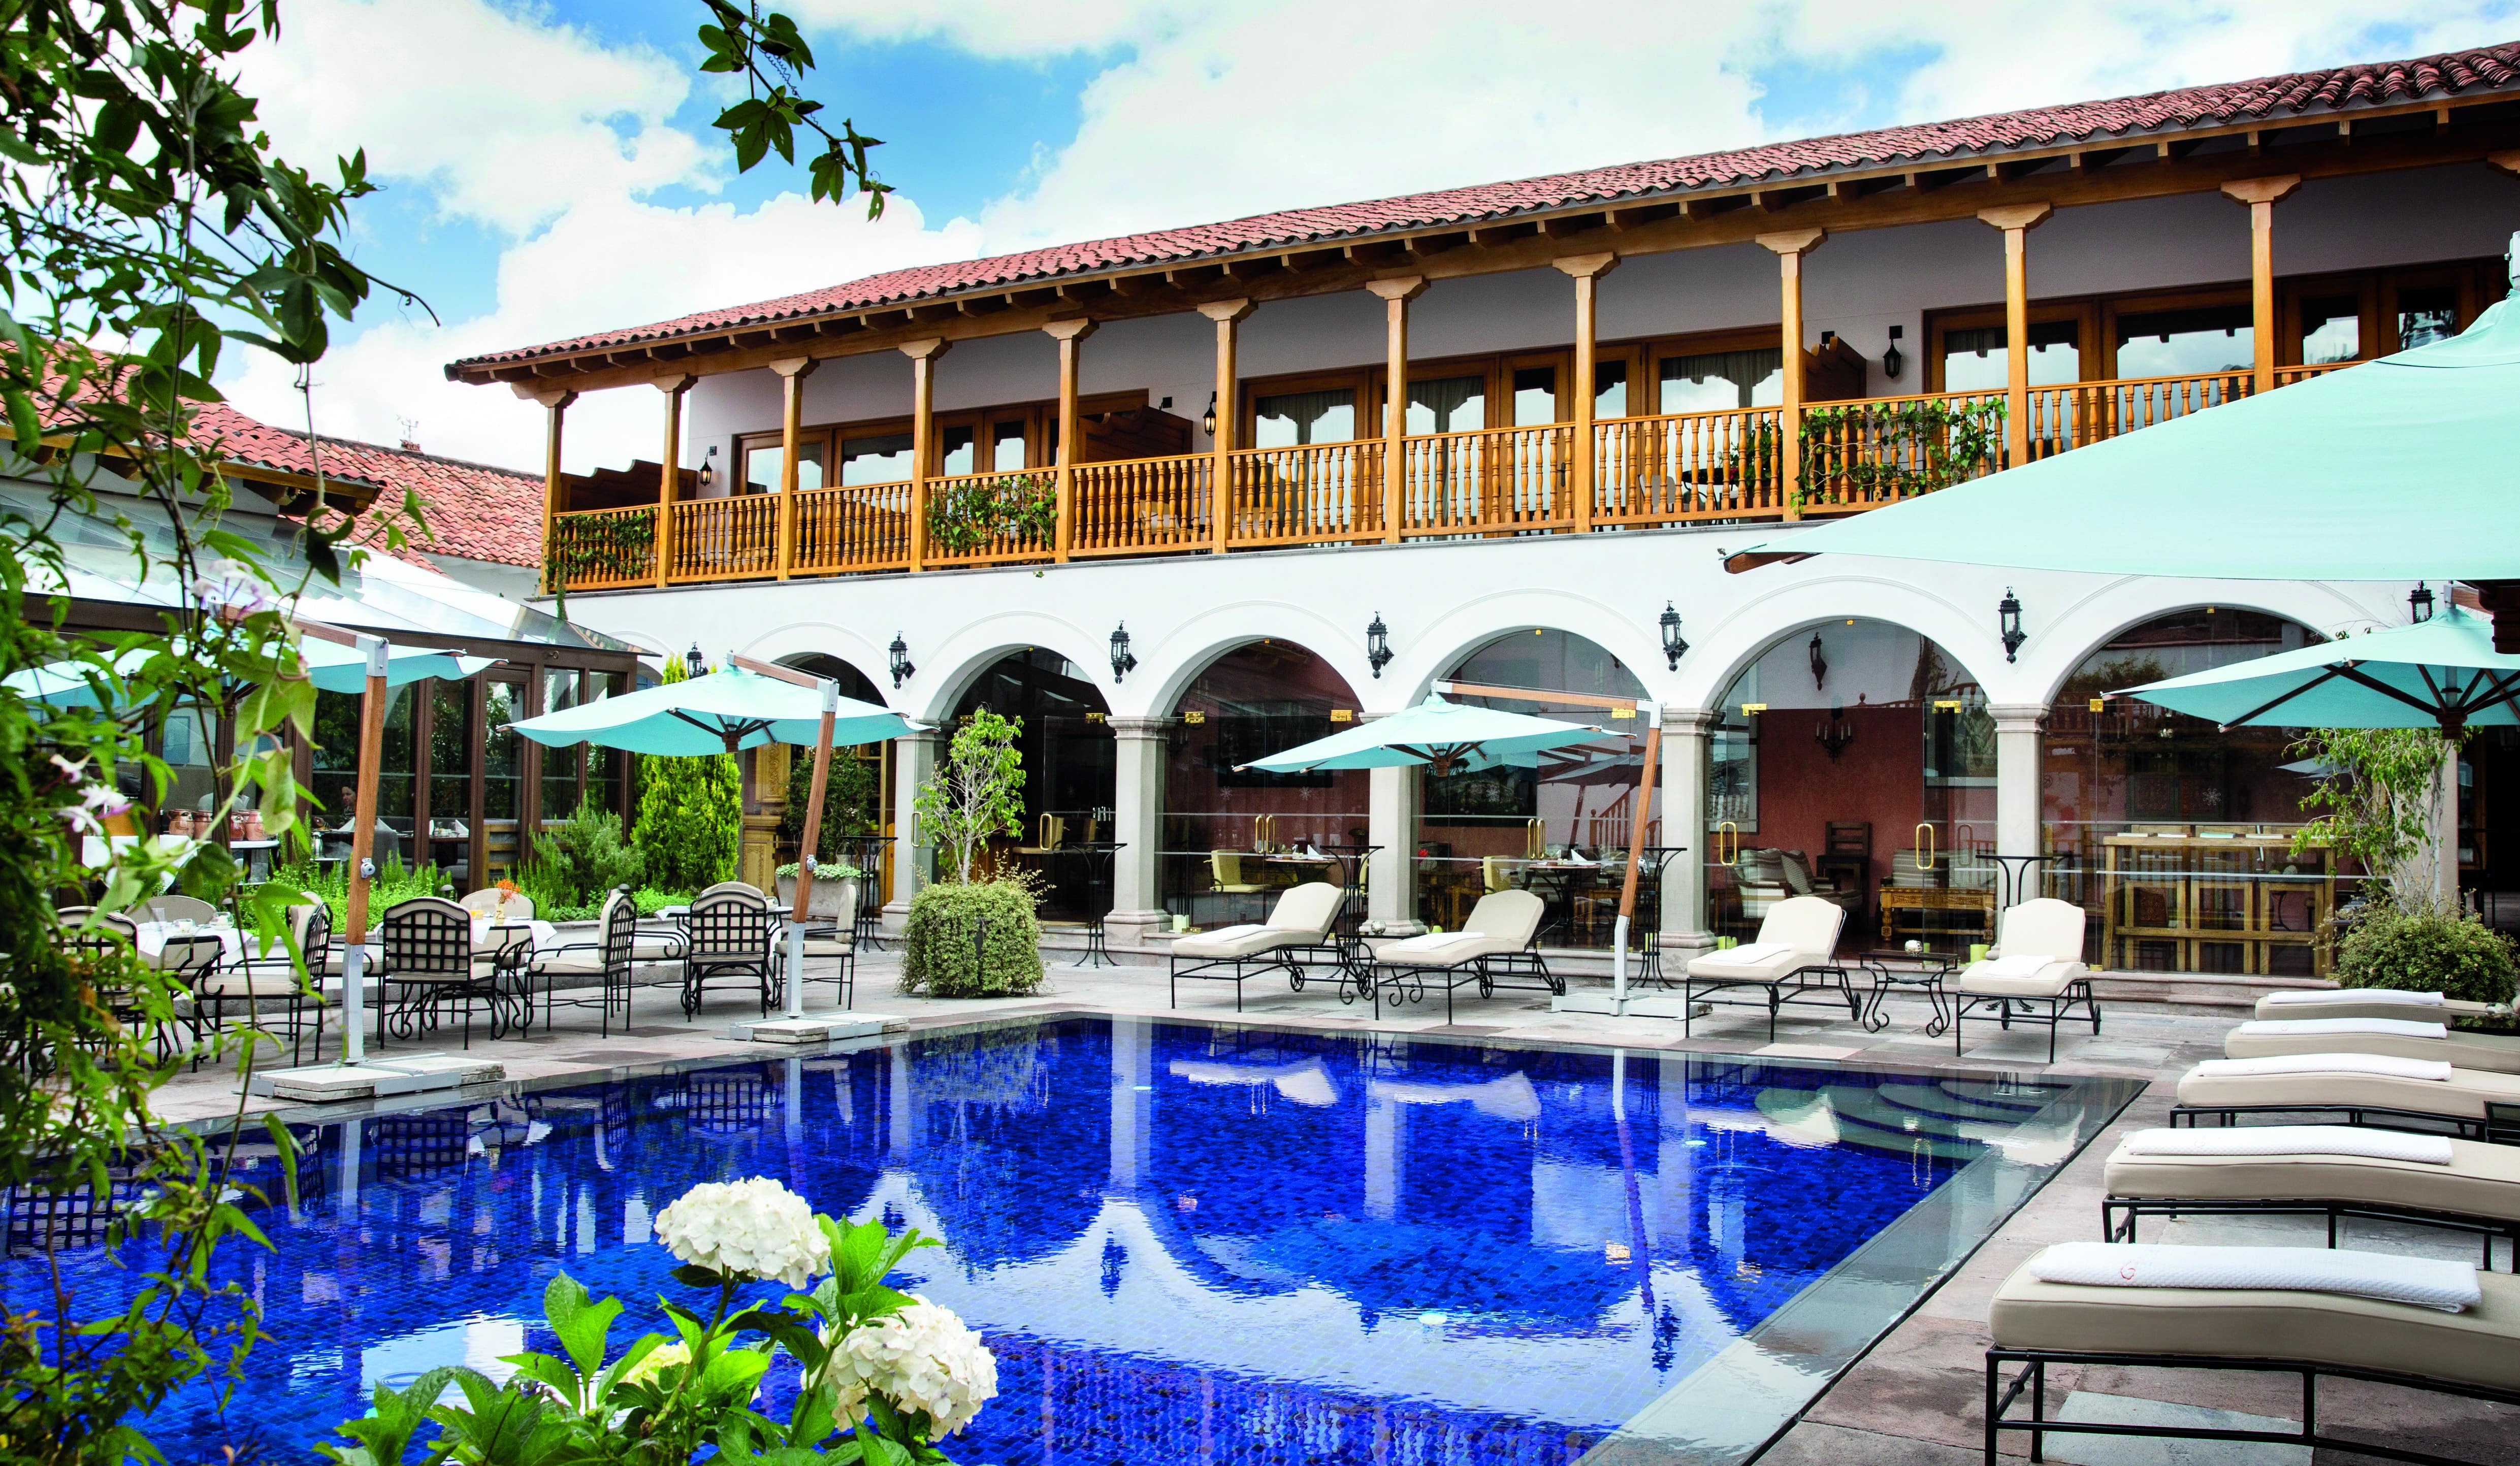 7 Peruaanse hotels in top 25 Zuid-Amerika